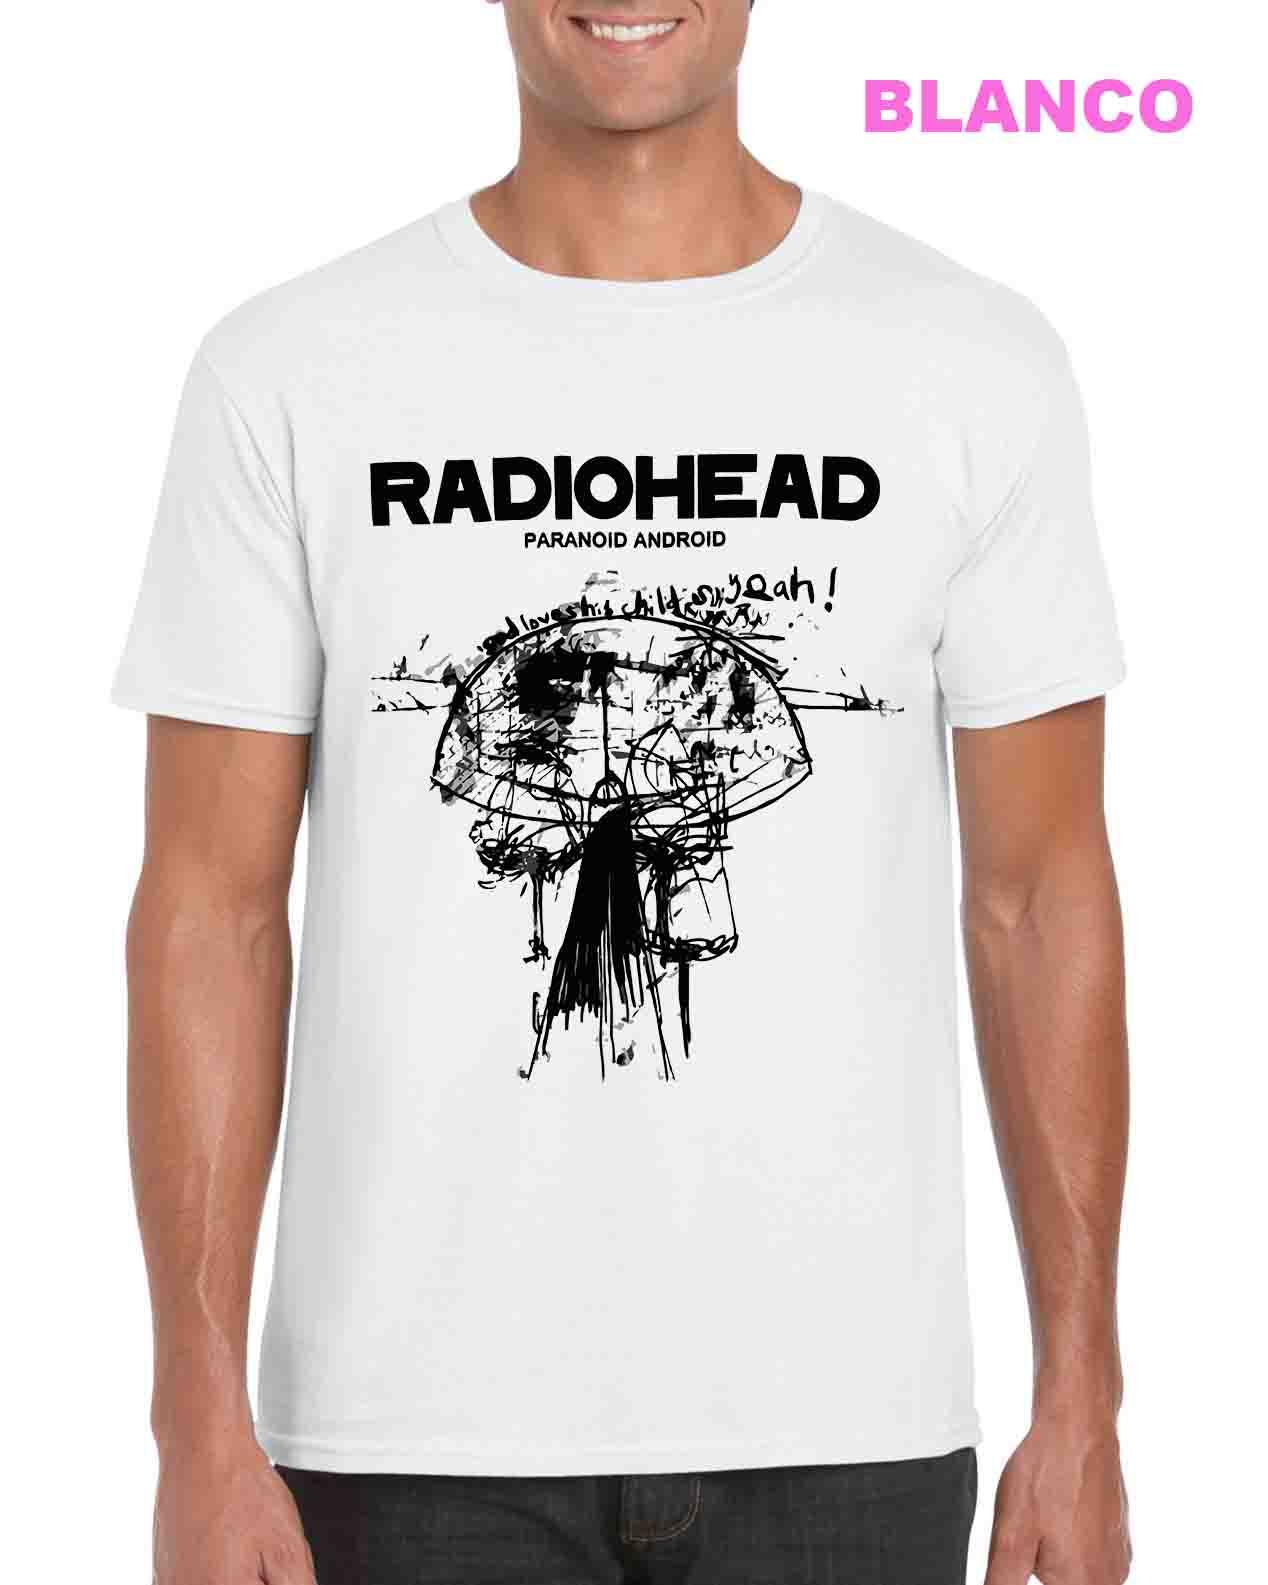 Radiohead - Paranoid